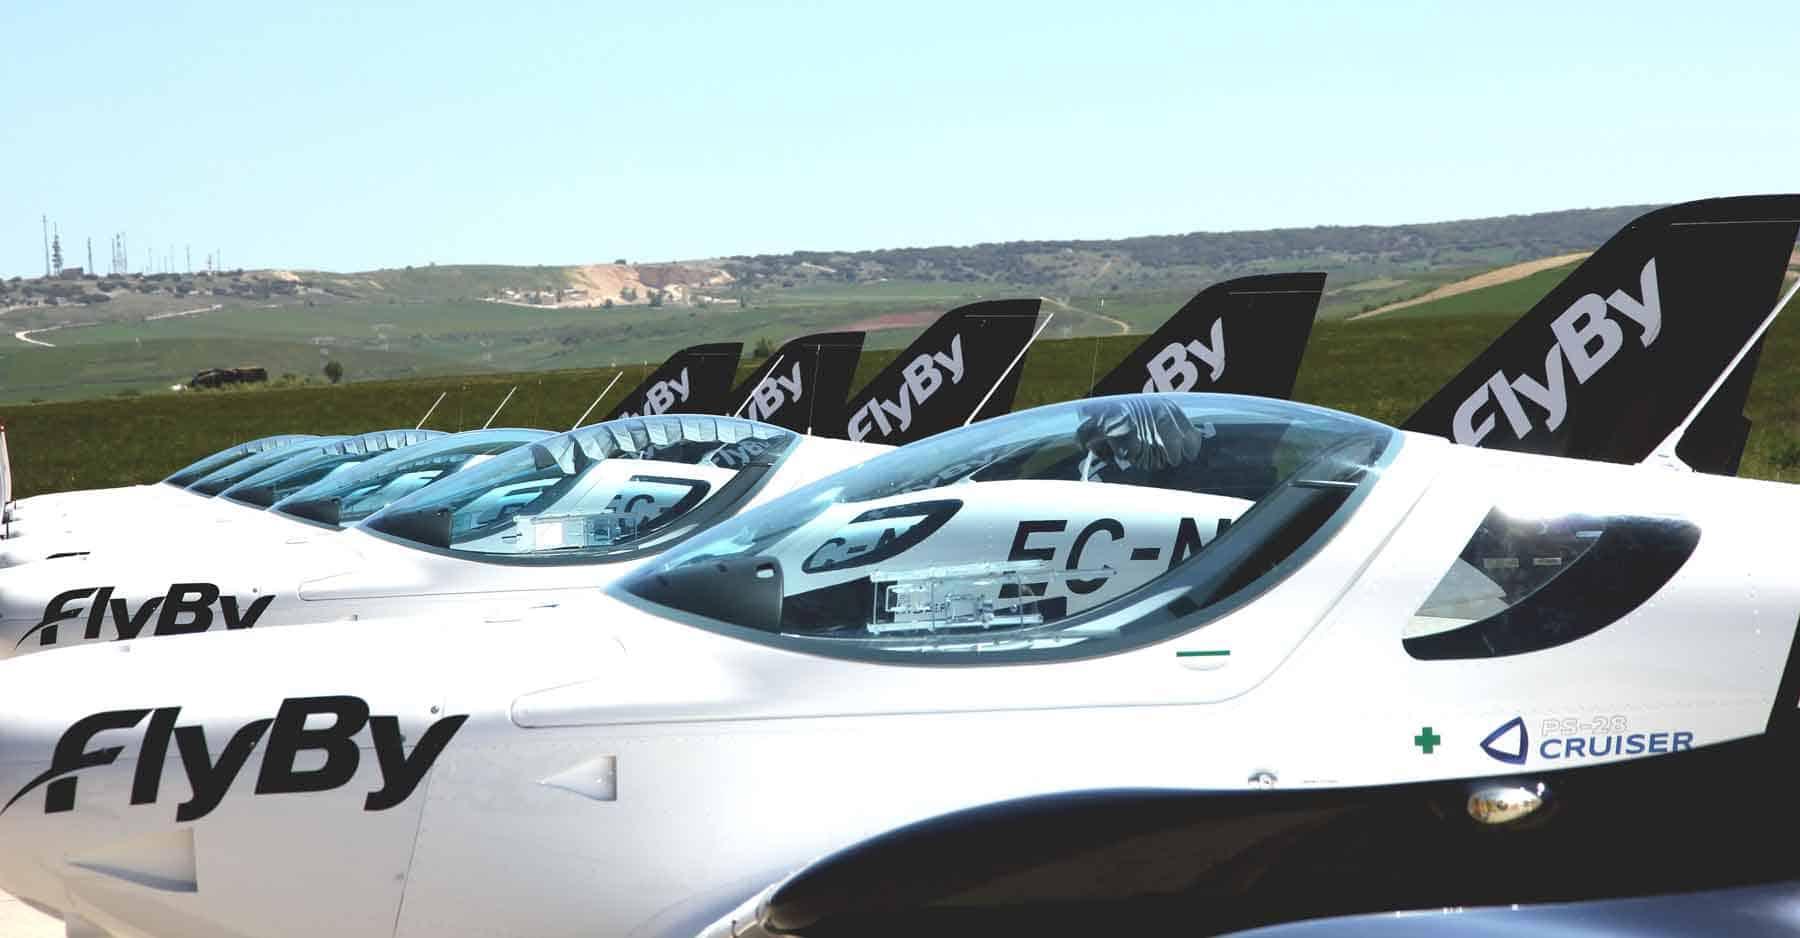 FlyBy flight school training planes